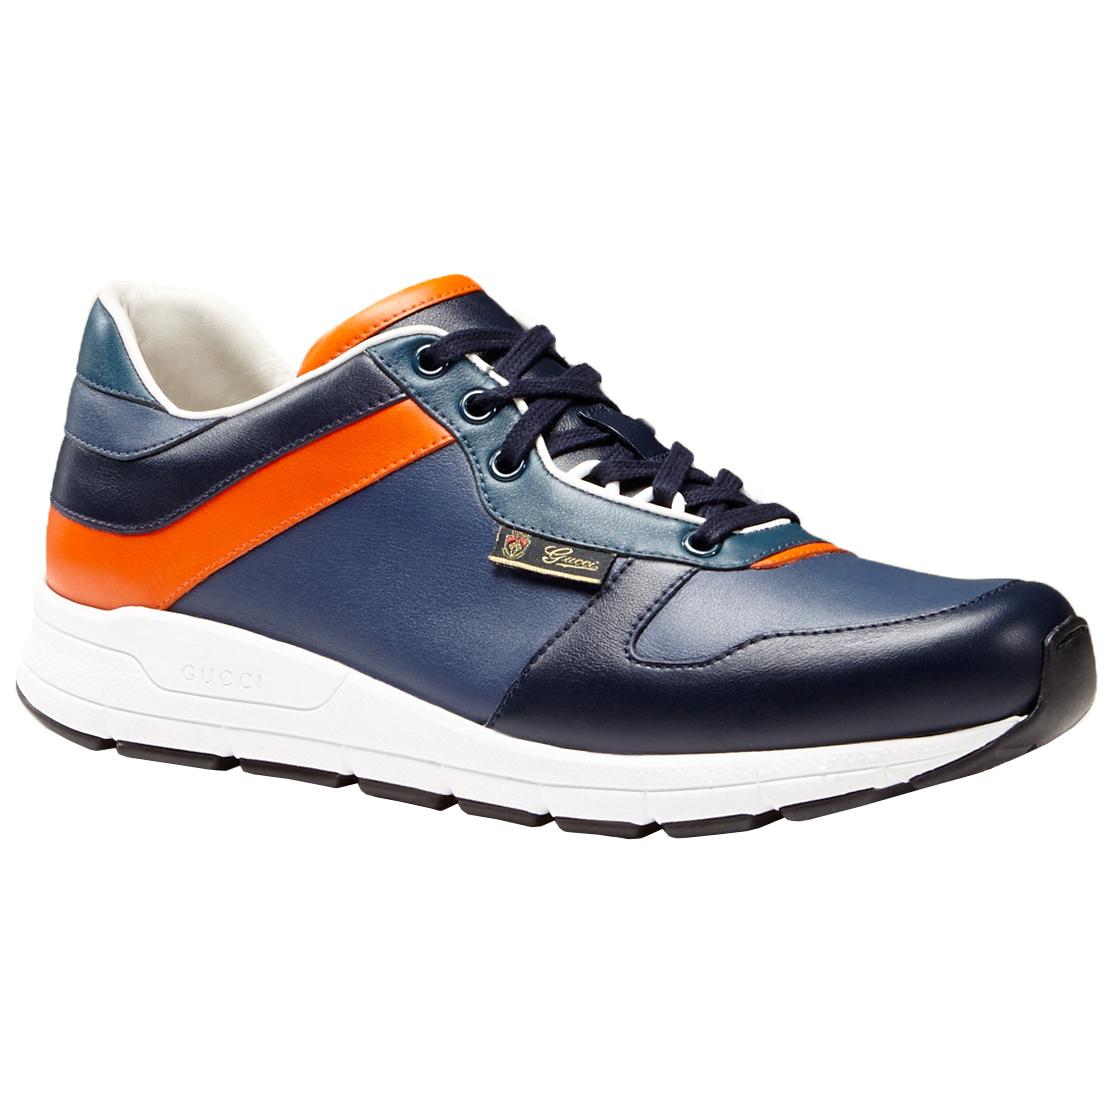 01509450c17 Gucci Men s Multicolor Leather Lace Up Low Top Sneakers Shoes